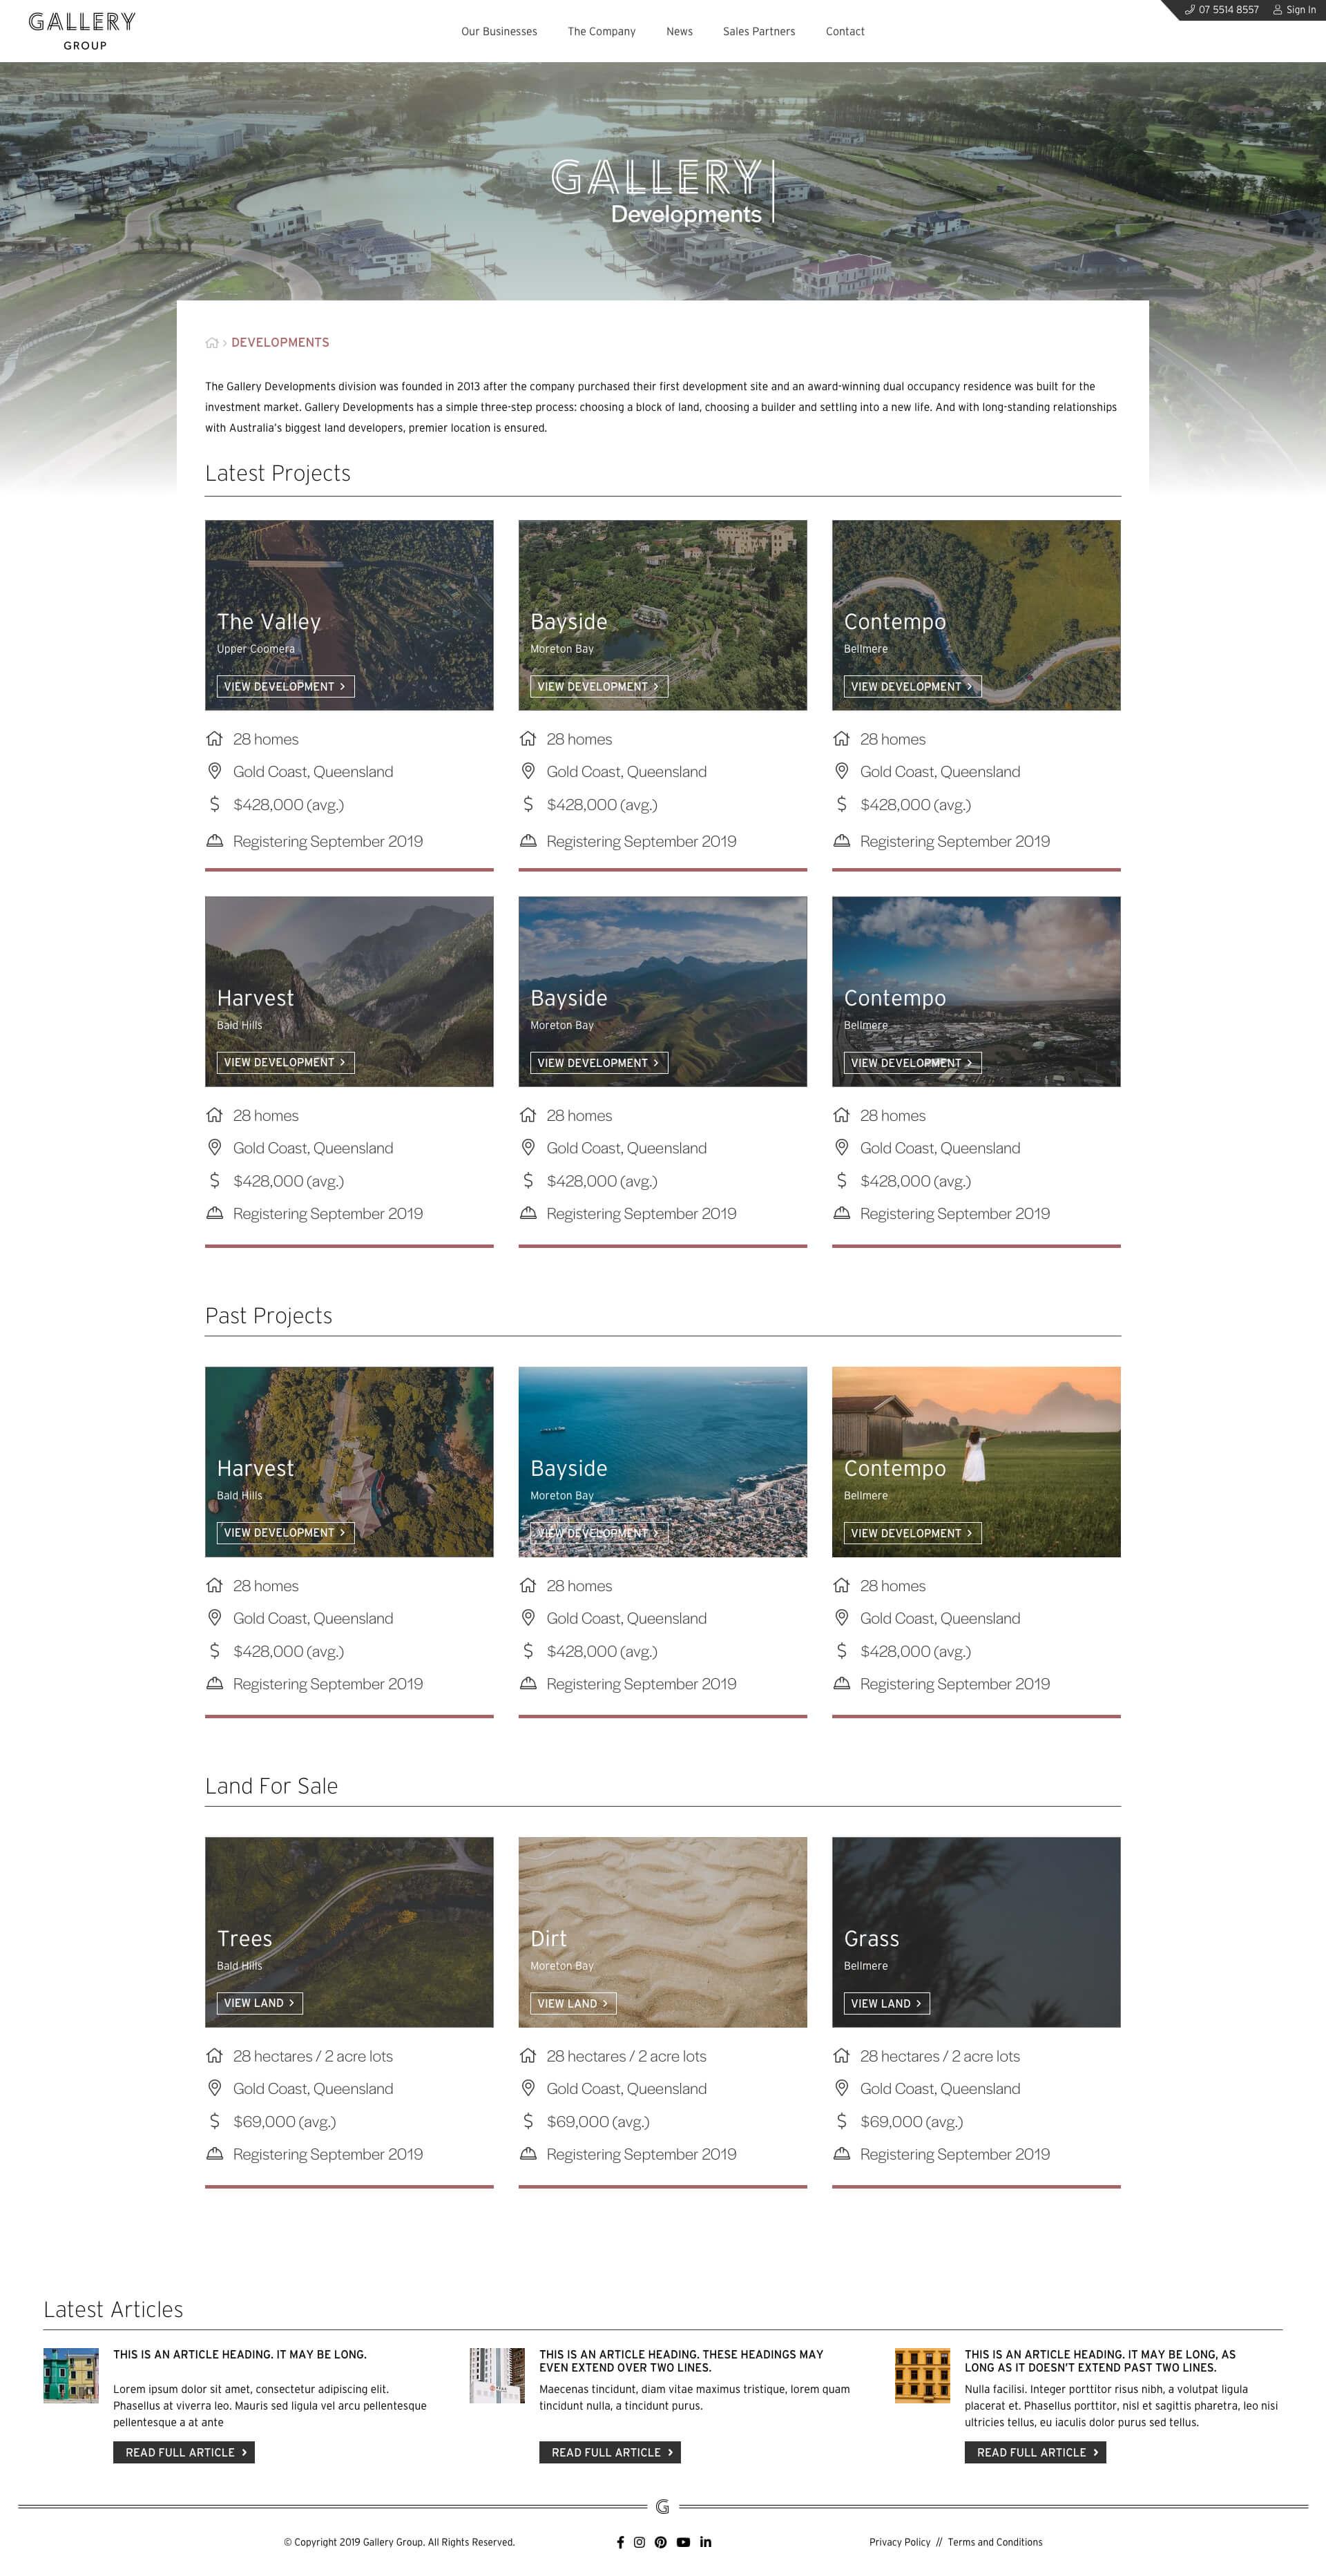 Gallery Group - Developments (Desktop)